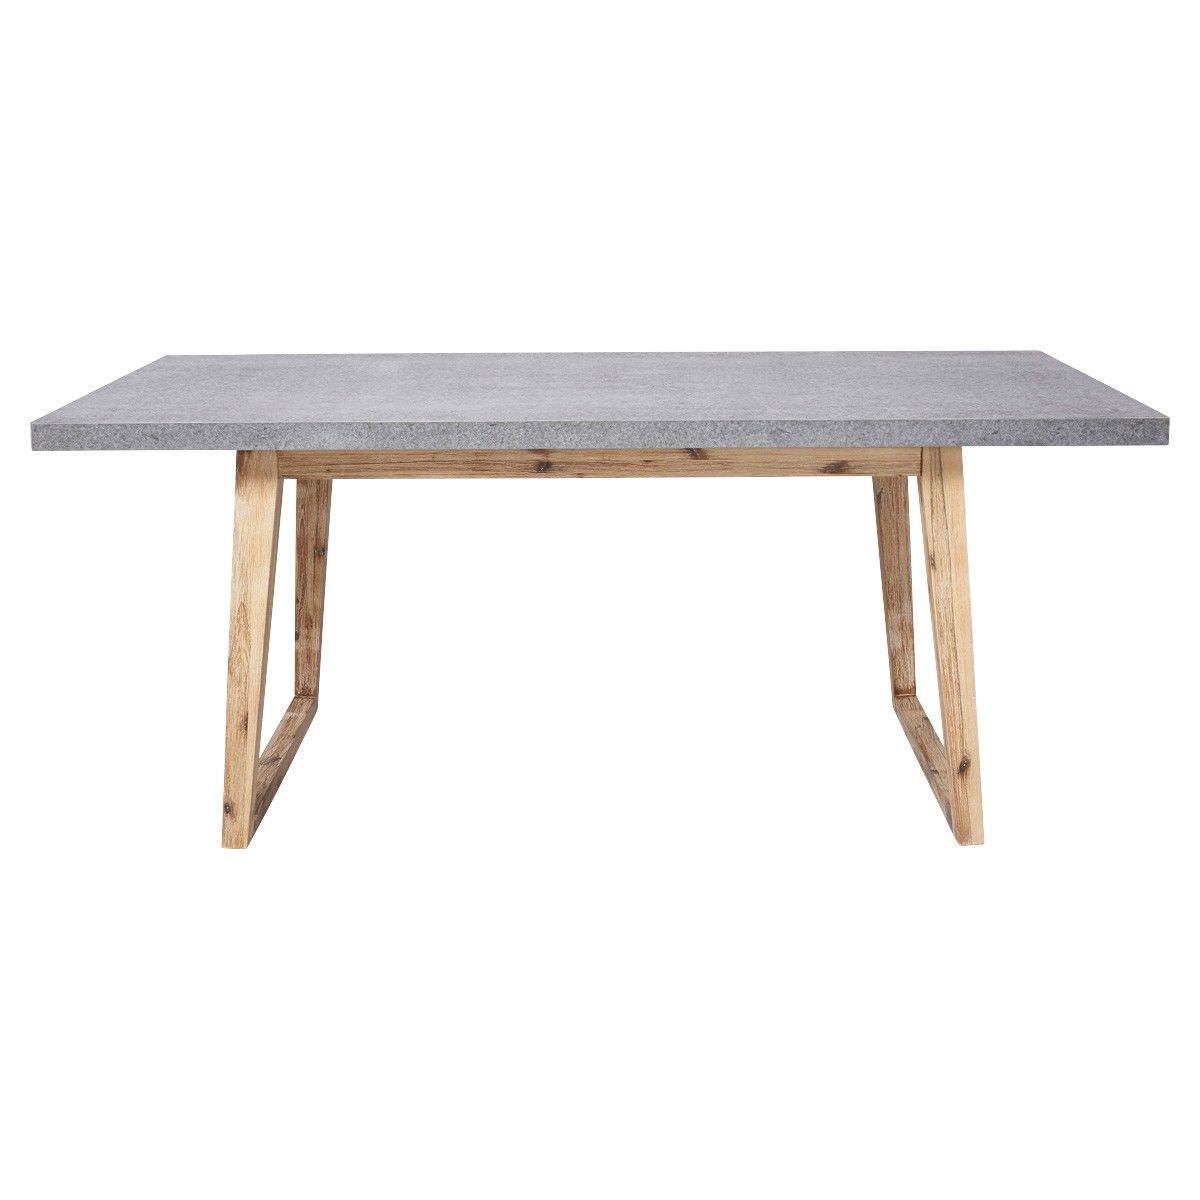 Bentley Cement Top Timber Indoor / Outdoor Dining Table, 180cm, Grey / Natural